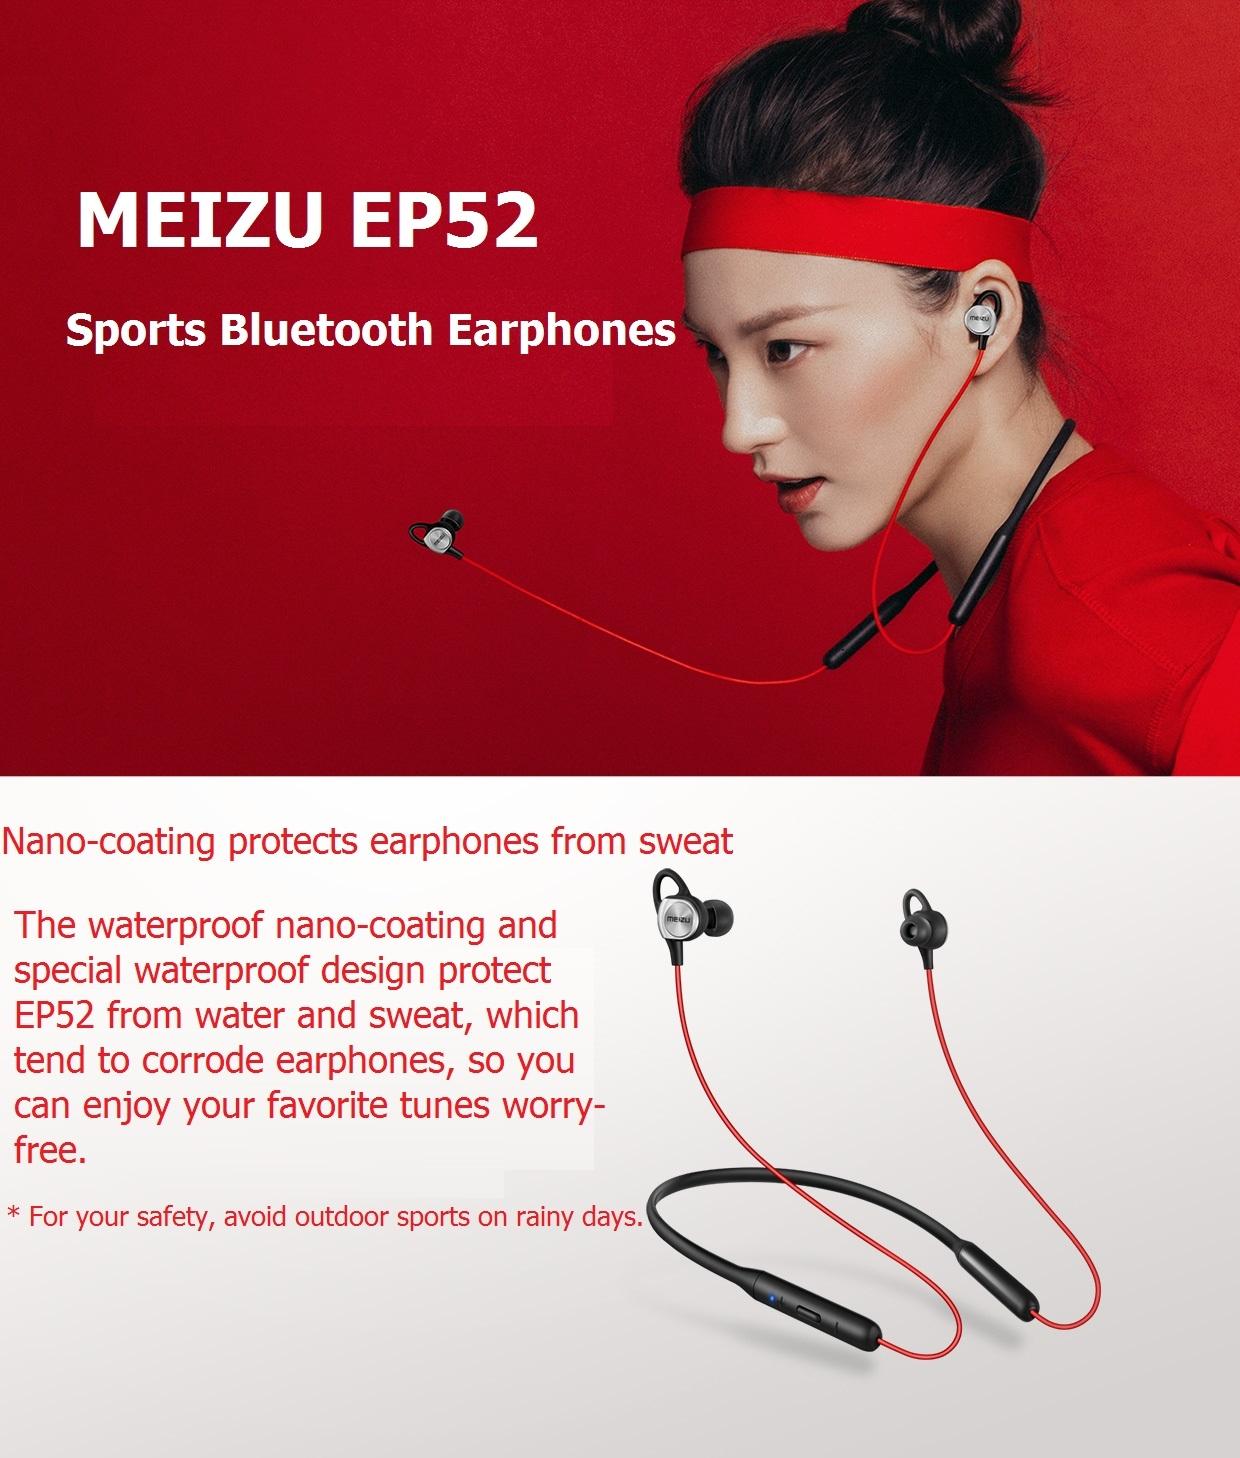 Meizu EP52